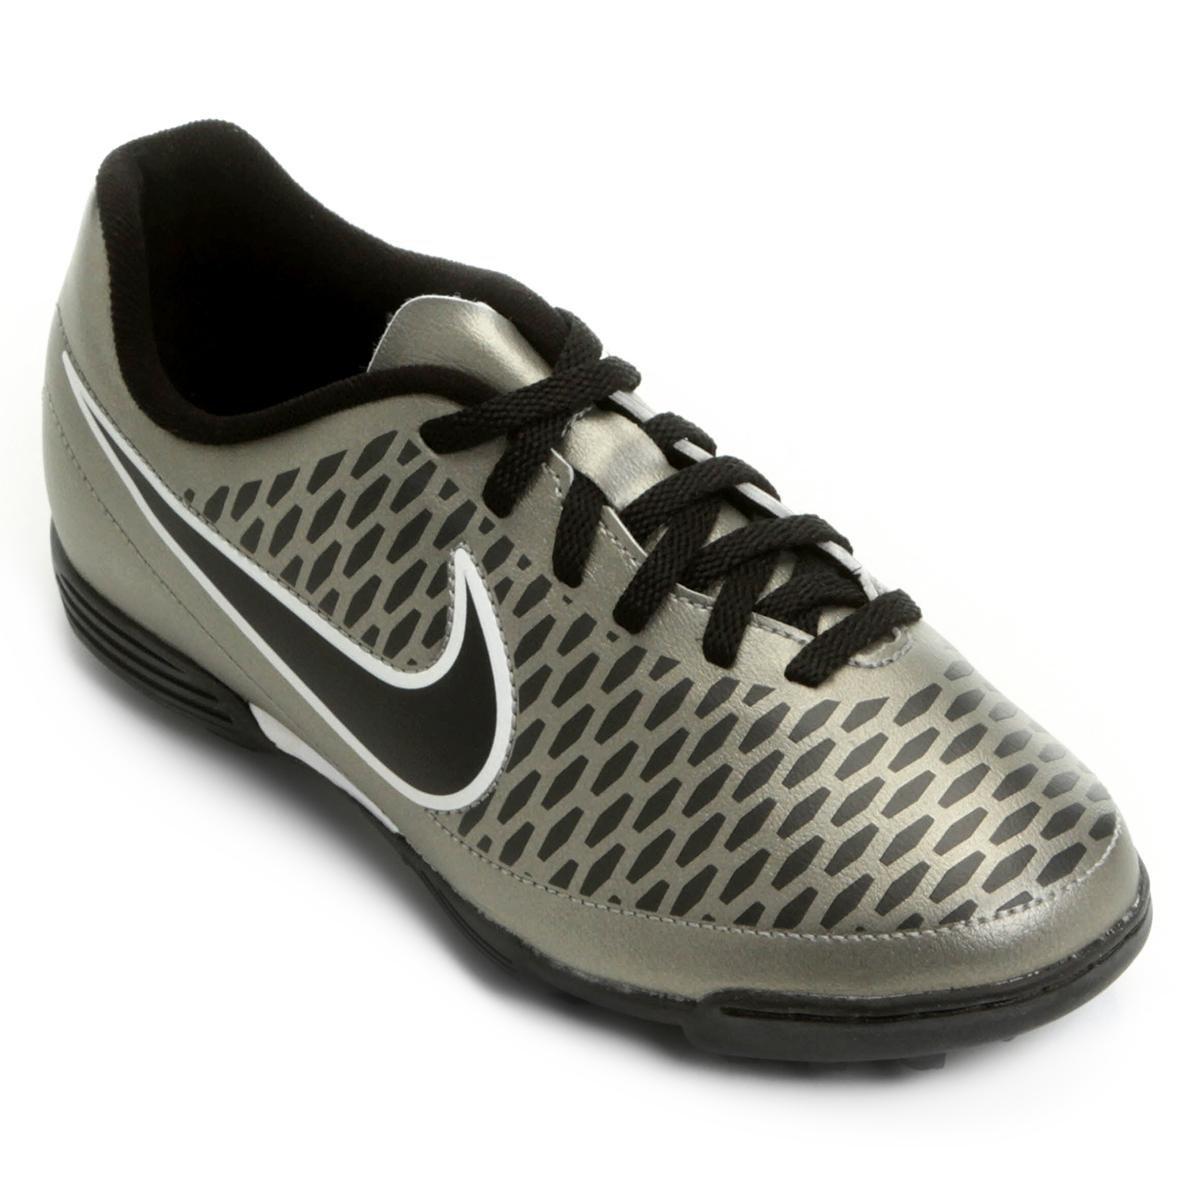 337e9c6c71244 Chuteira Nike Magista Ola TF Society Infantil - Compre Agora